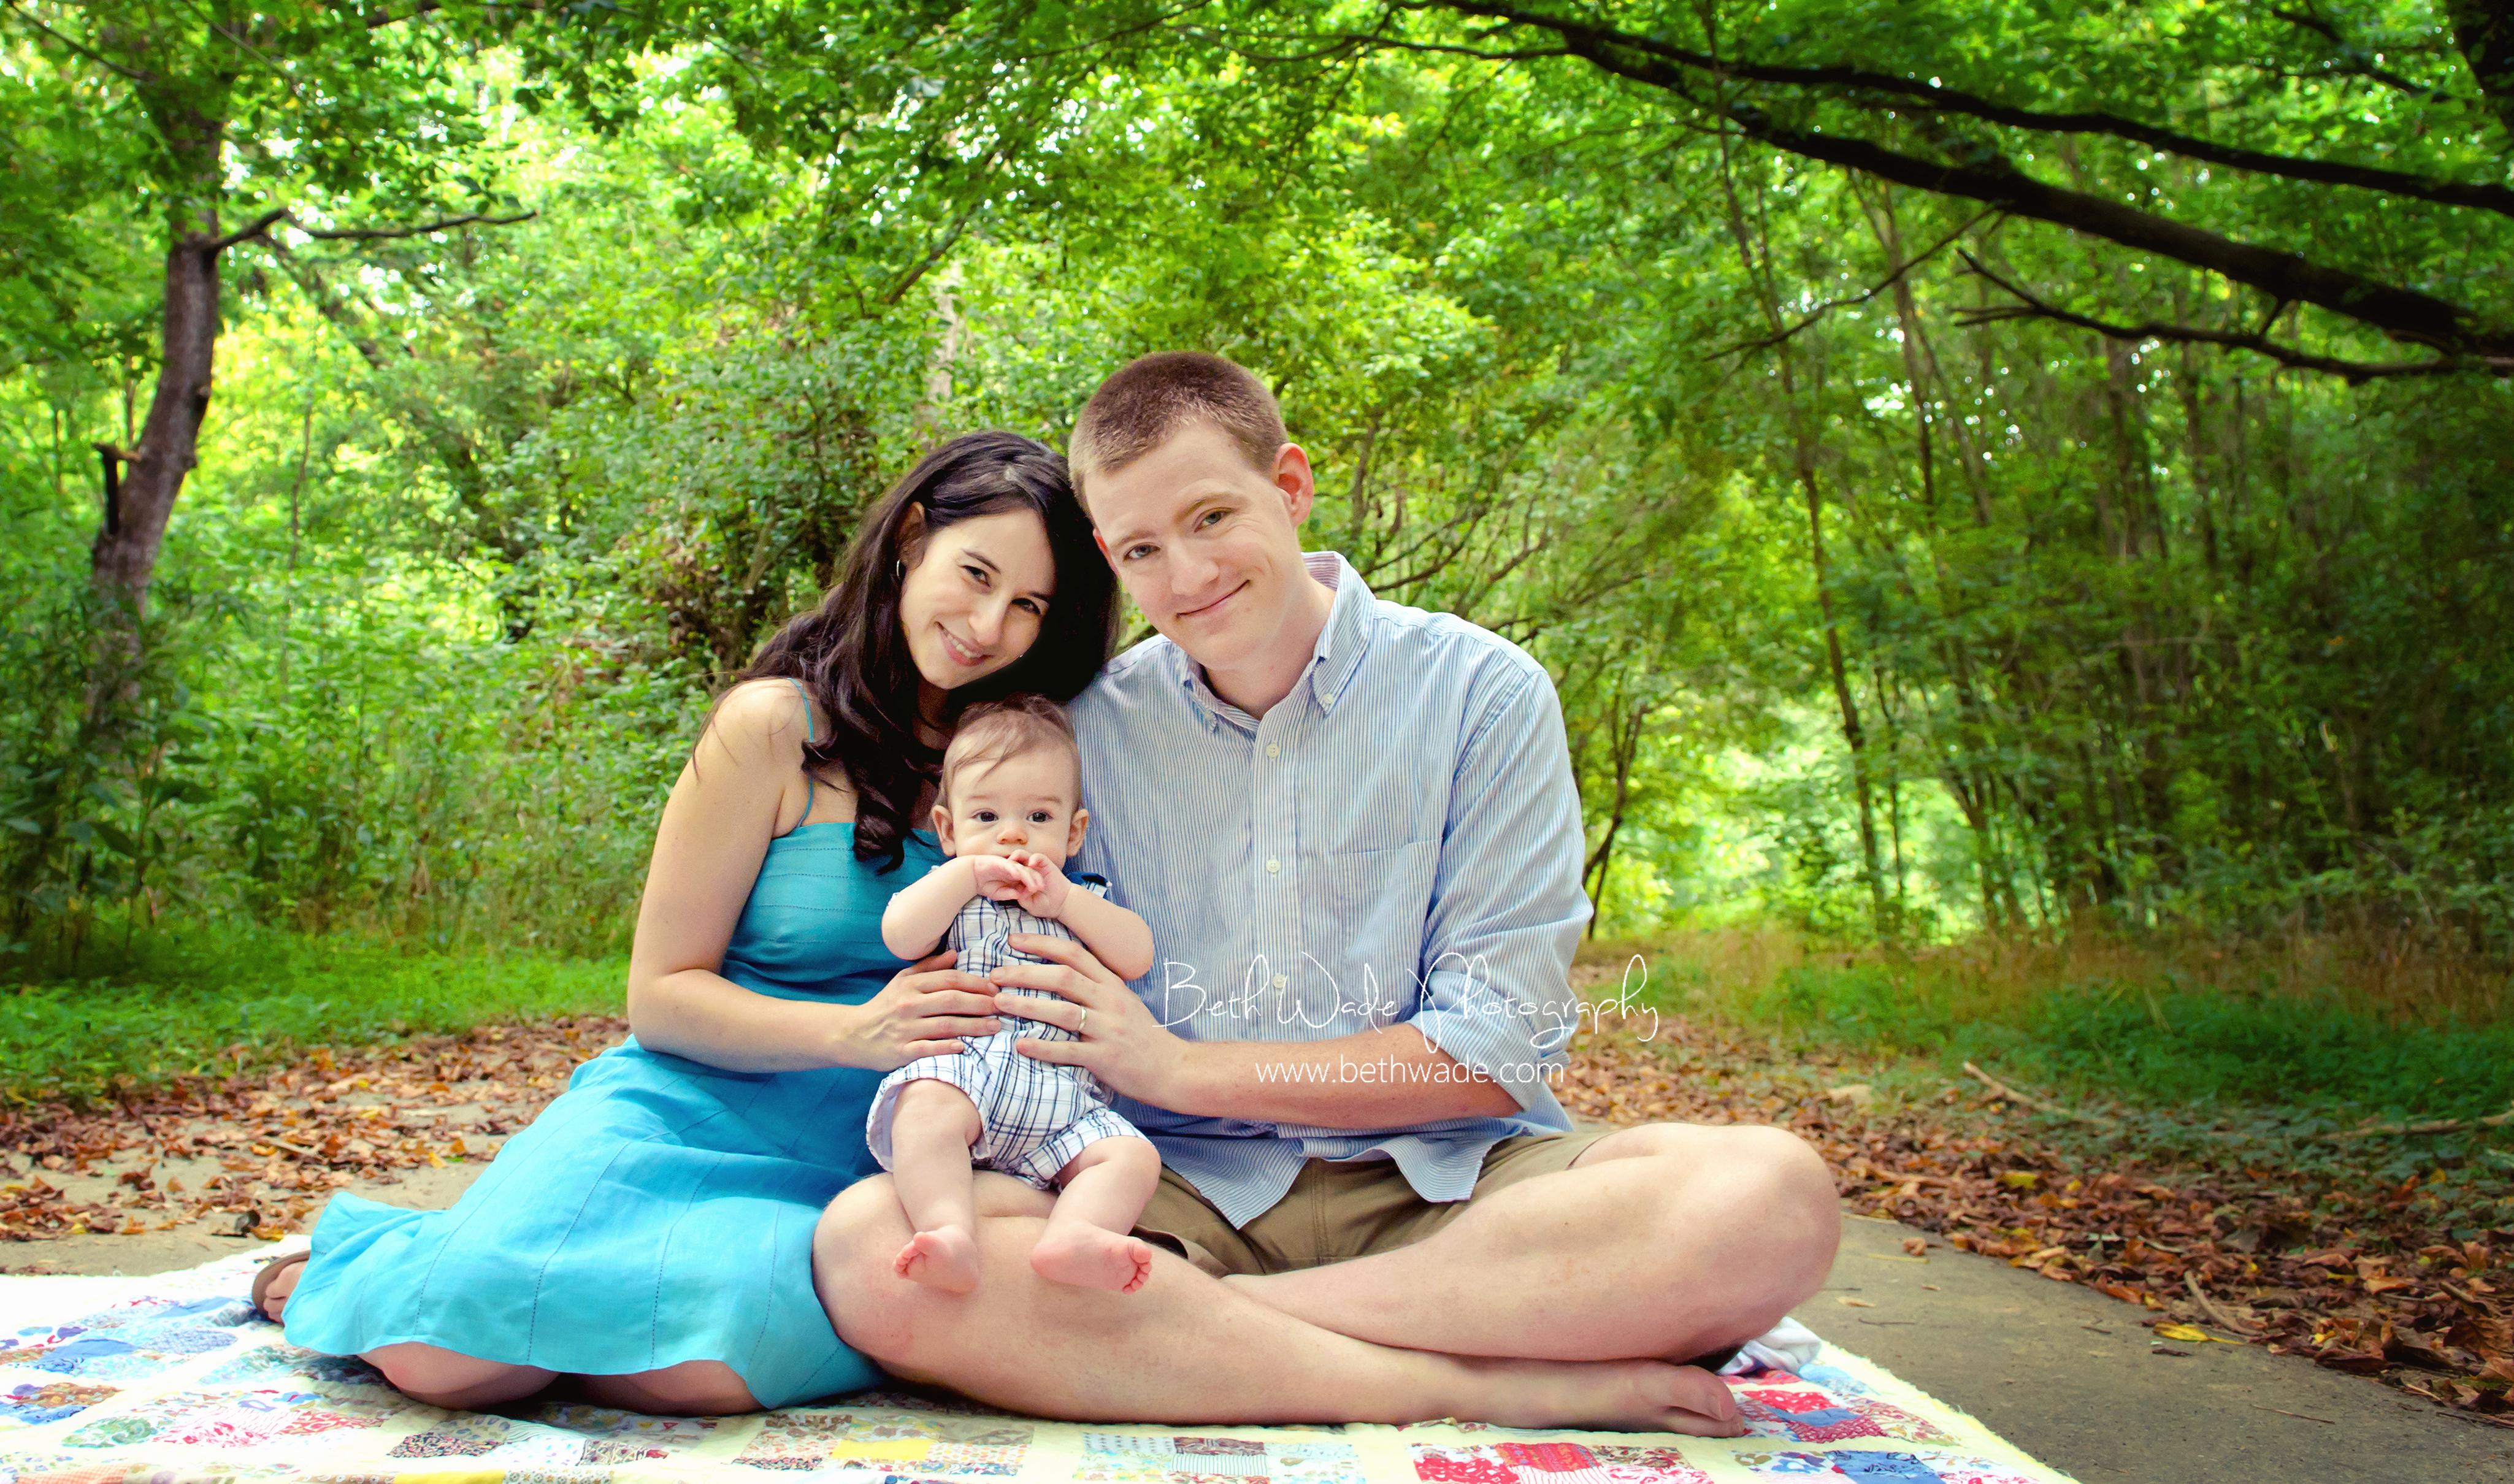 winston salem family photographer